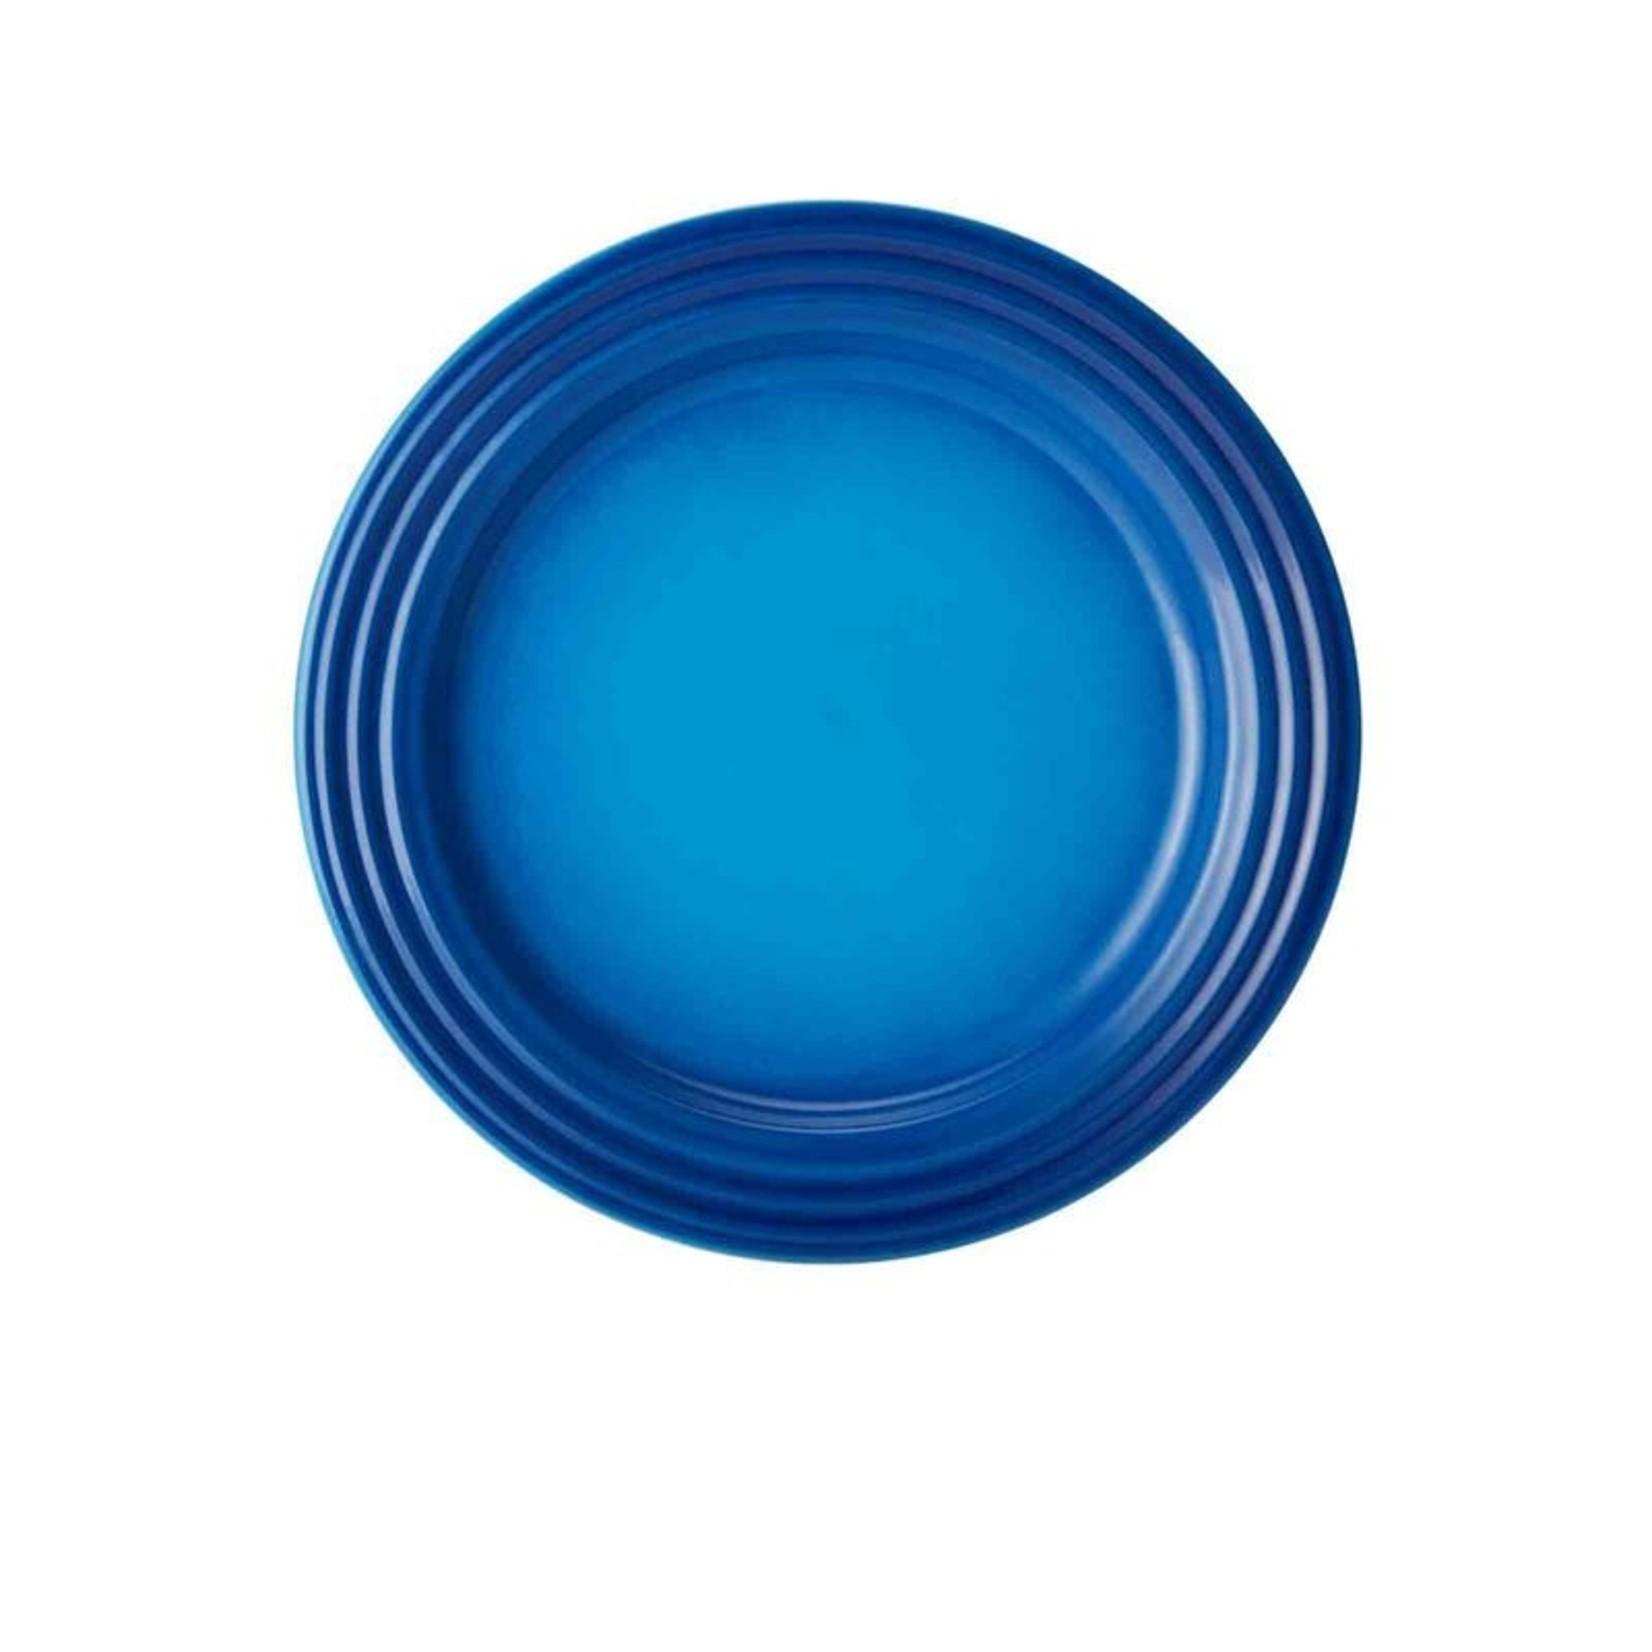 Le Creuset Classic Dessert/Salad Plate